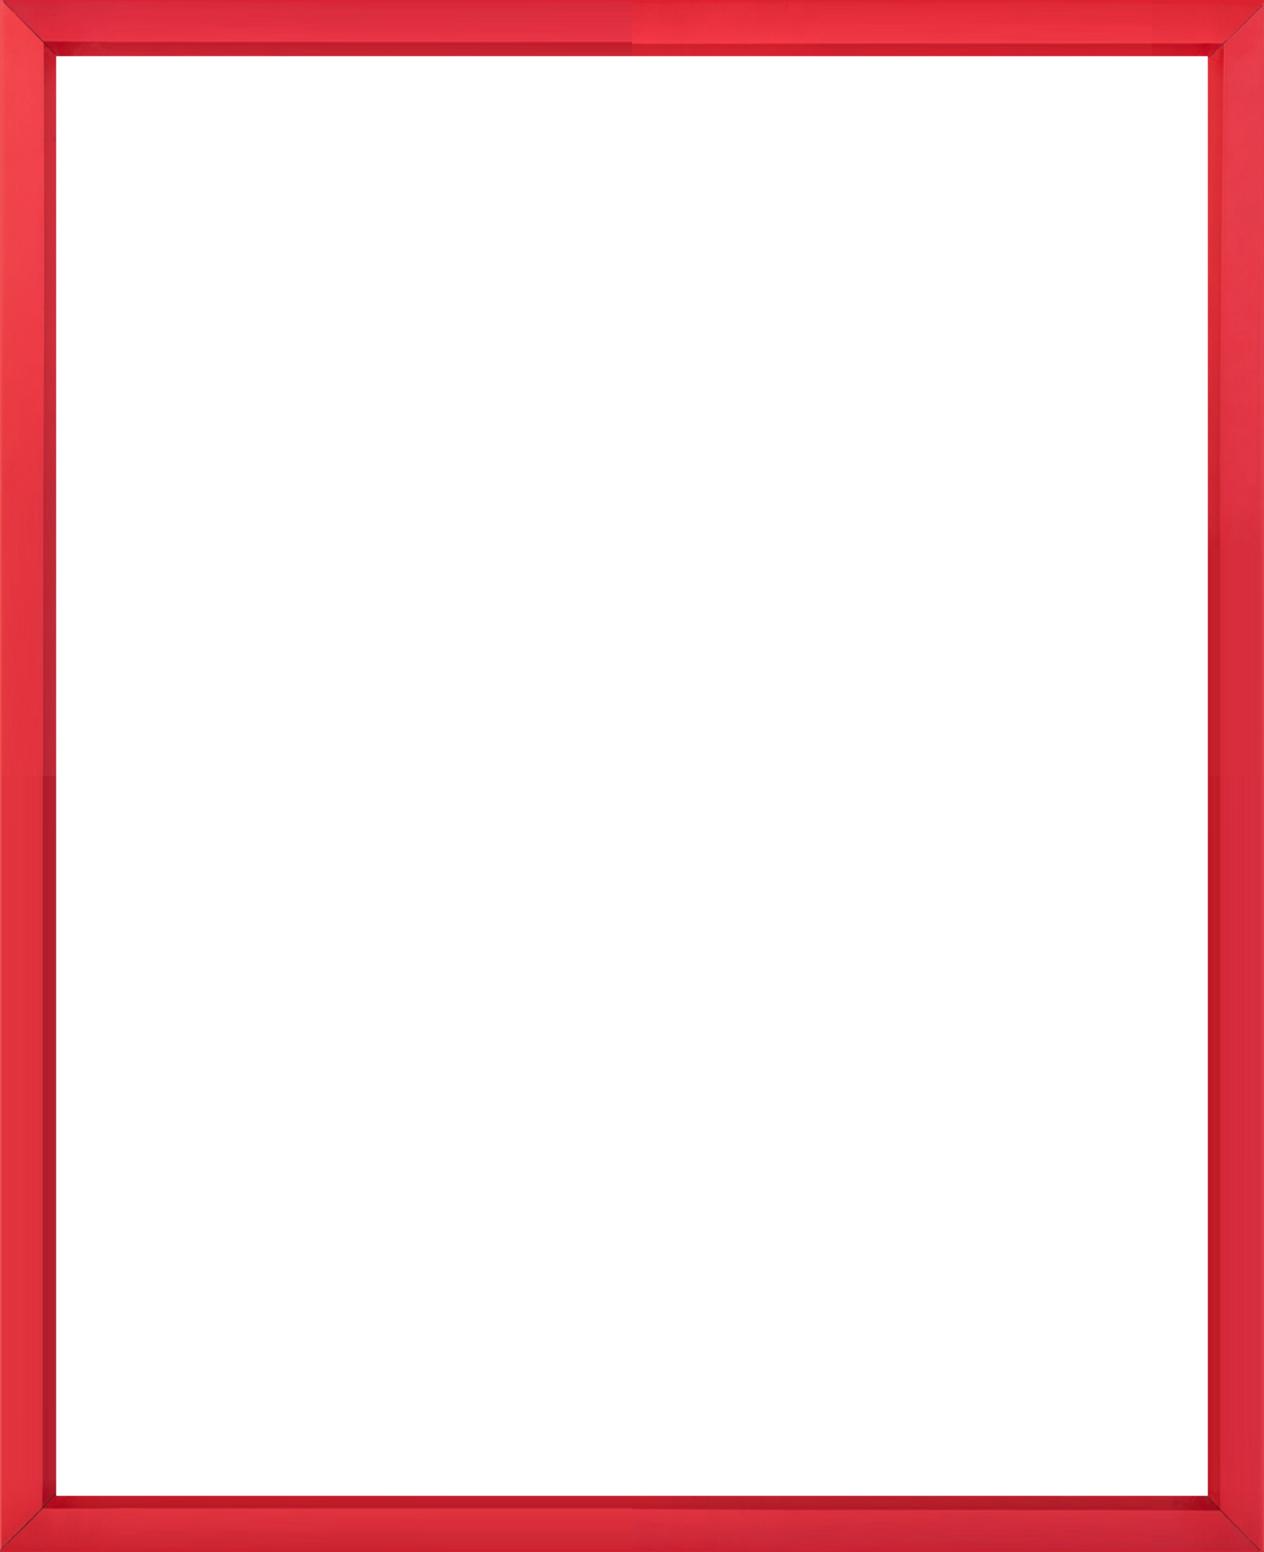 814-1426661637